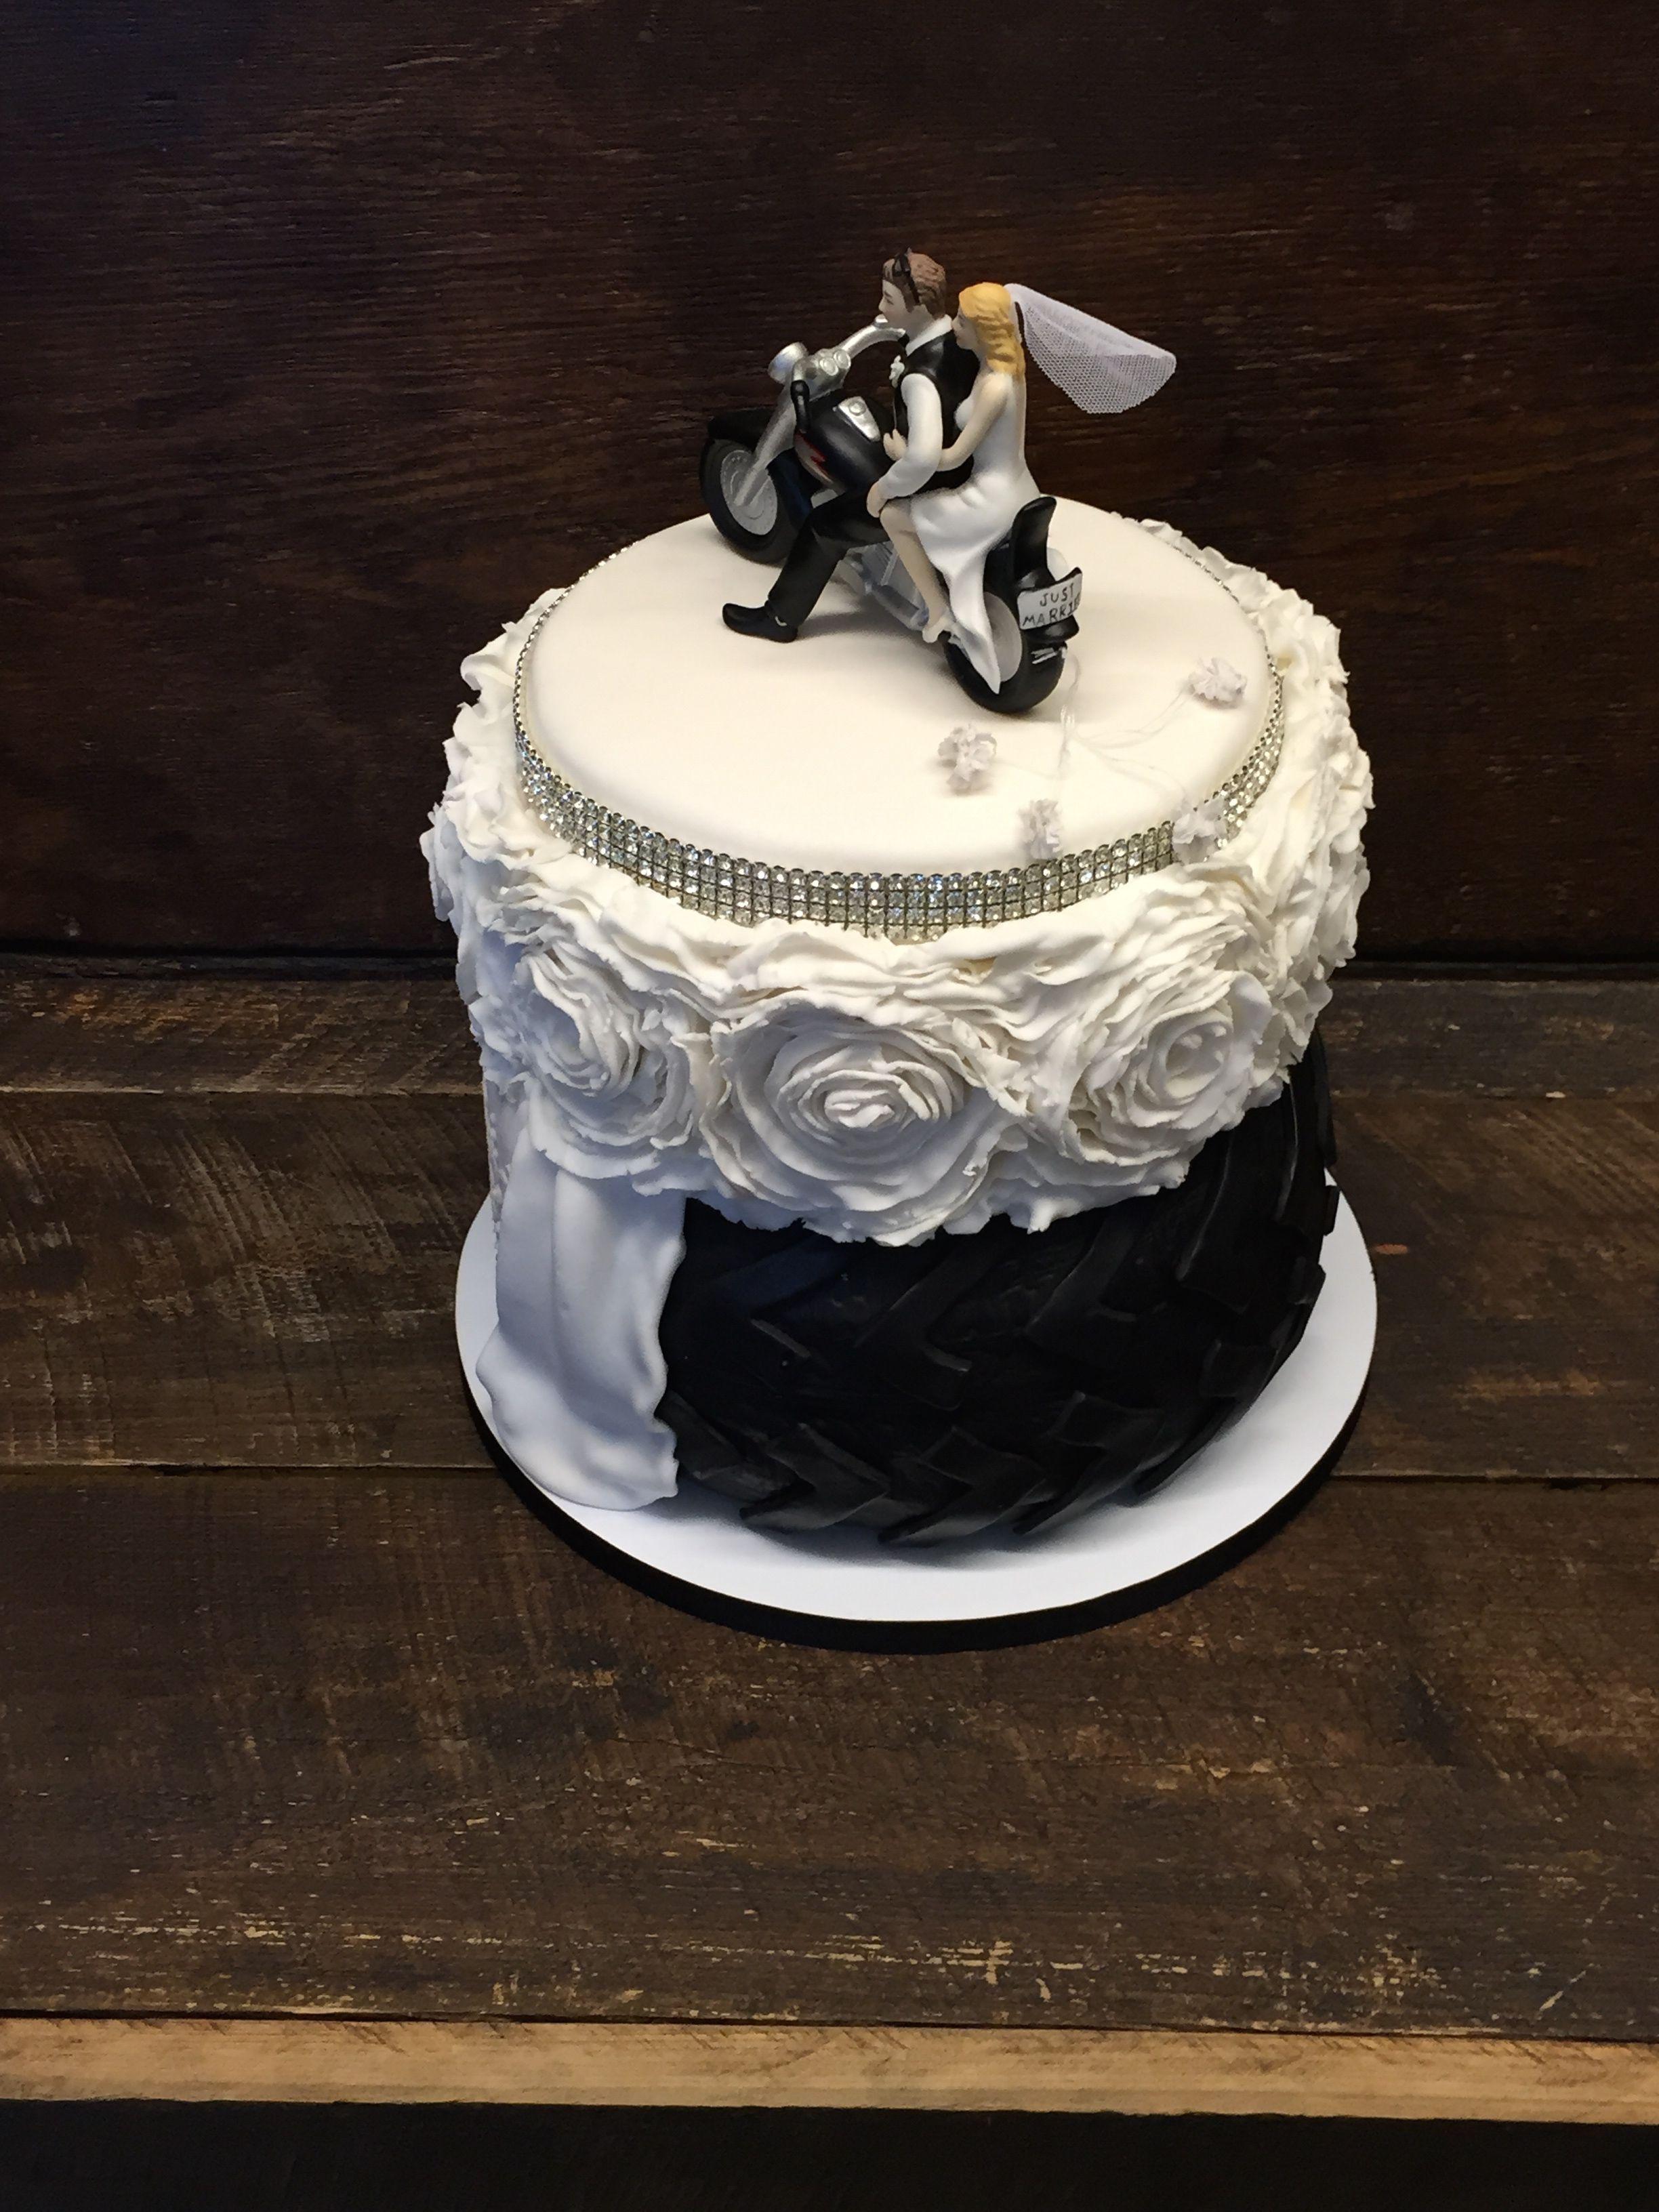 Our Motorcycle Bride Groom Wedding Cake created custom Tire